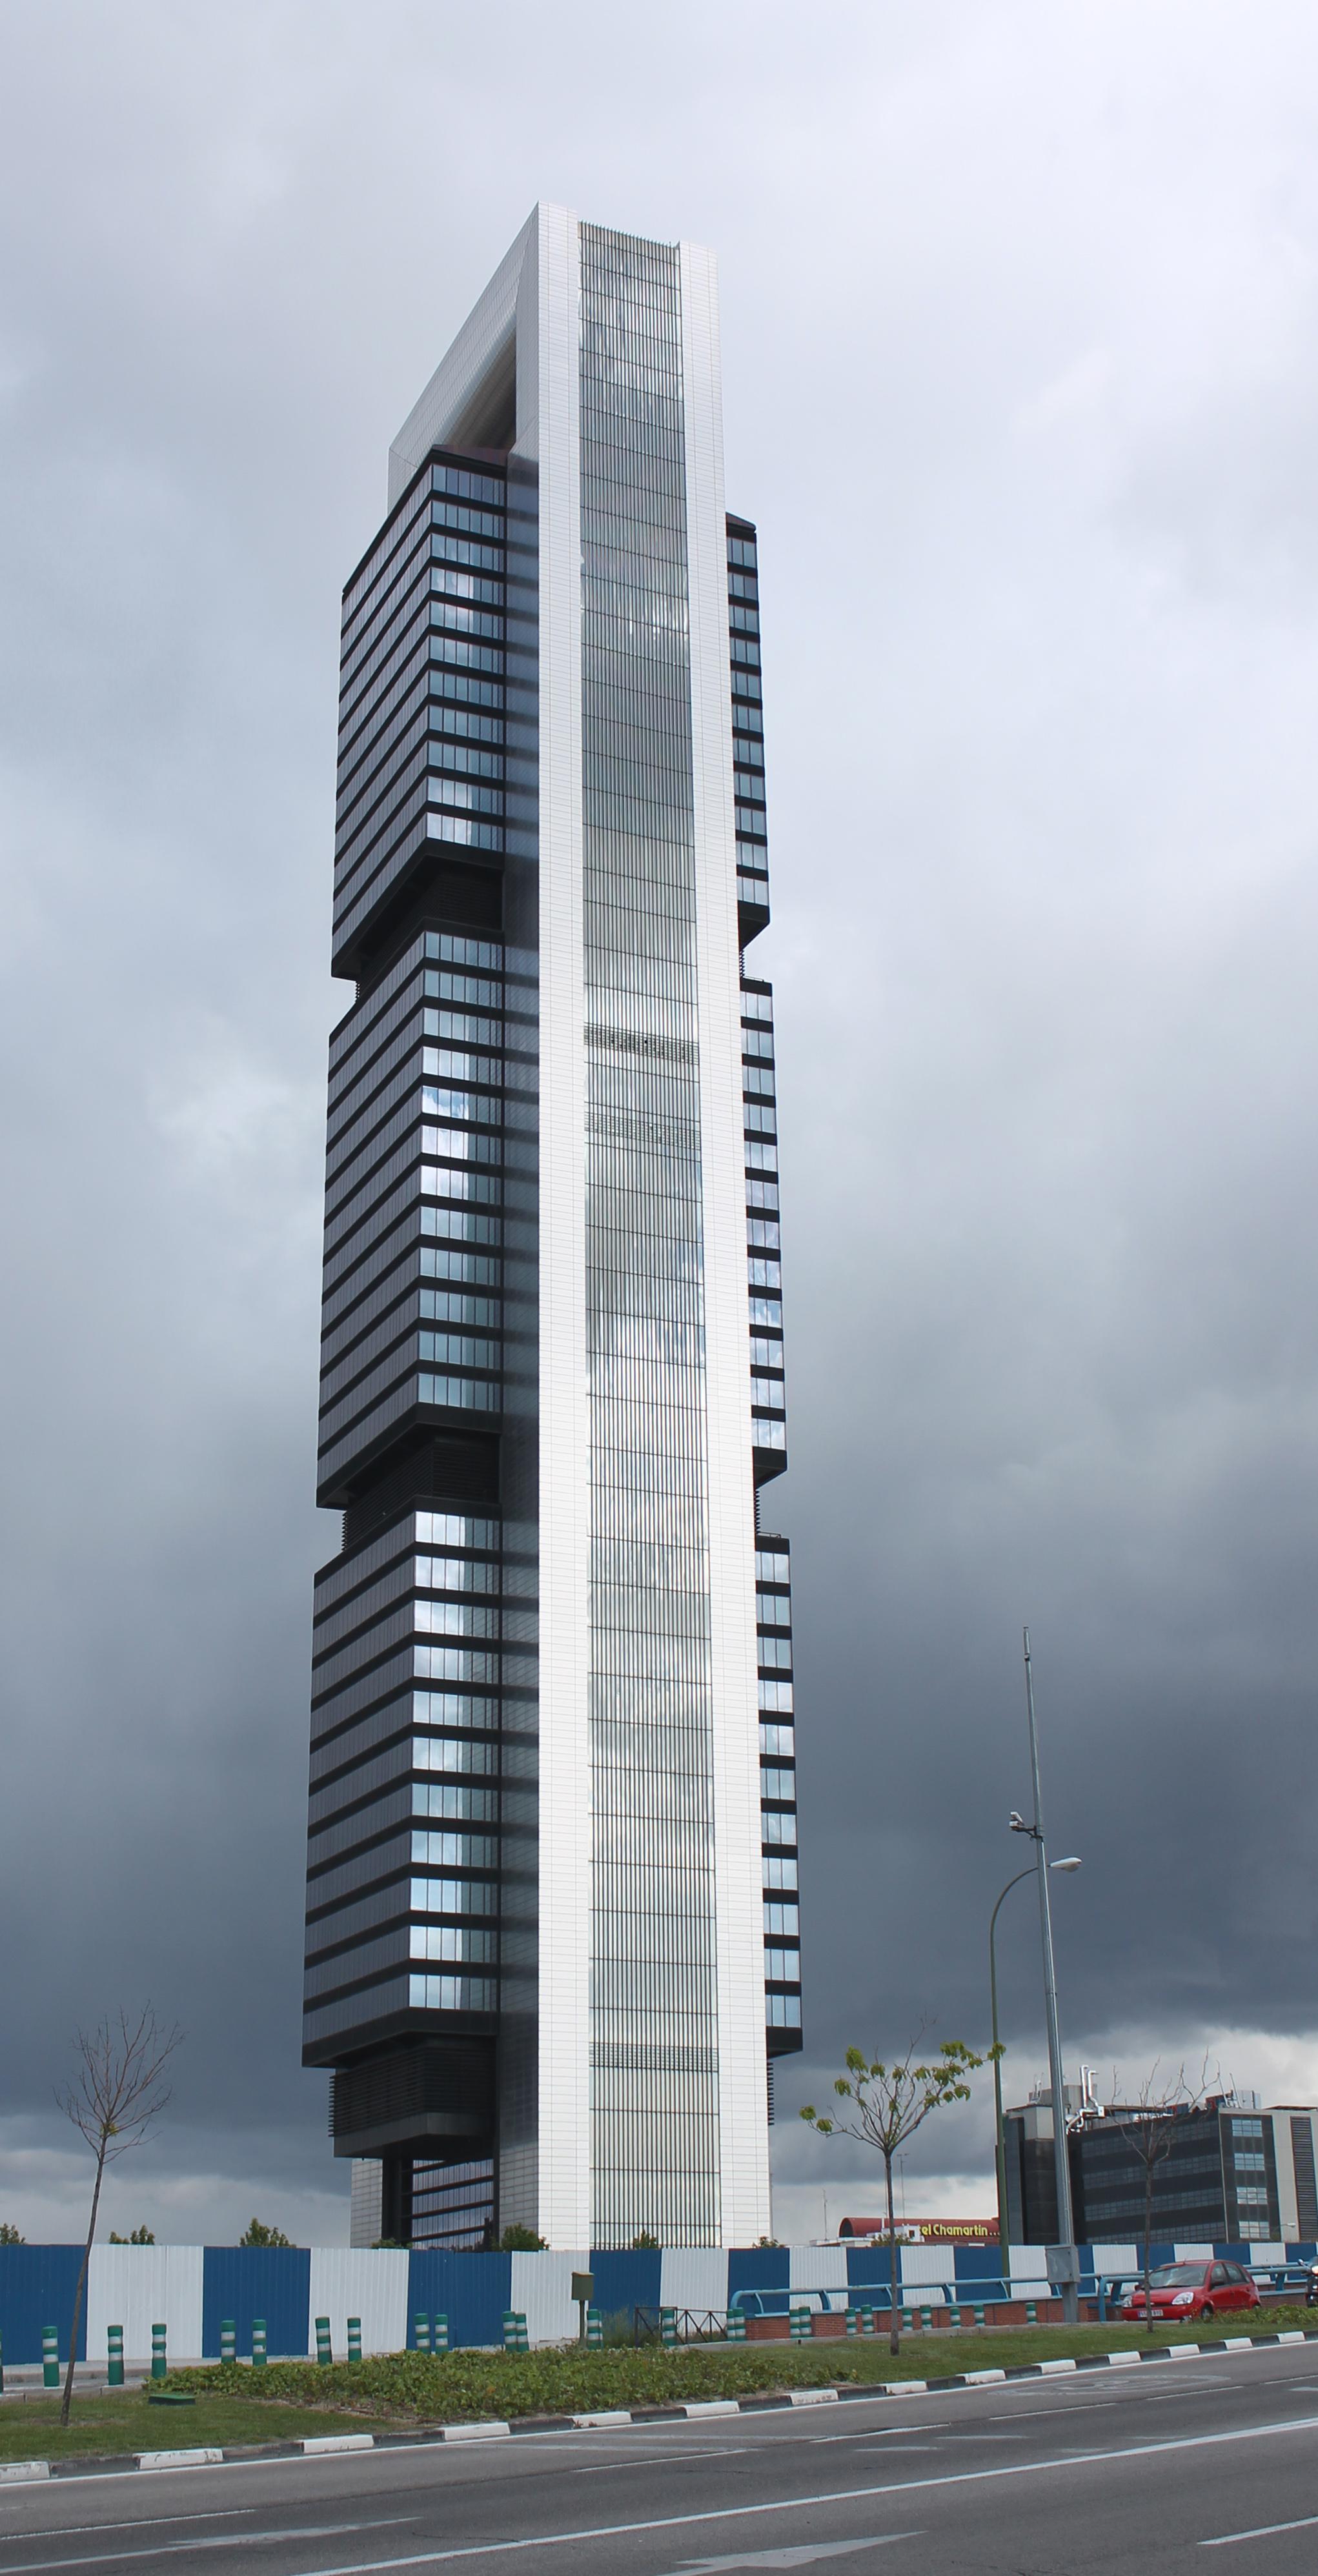 Caja madrid images frompo for Bankia oficina de internet entrar